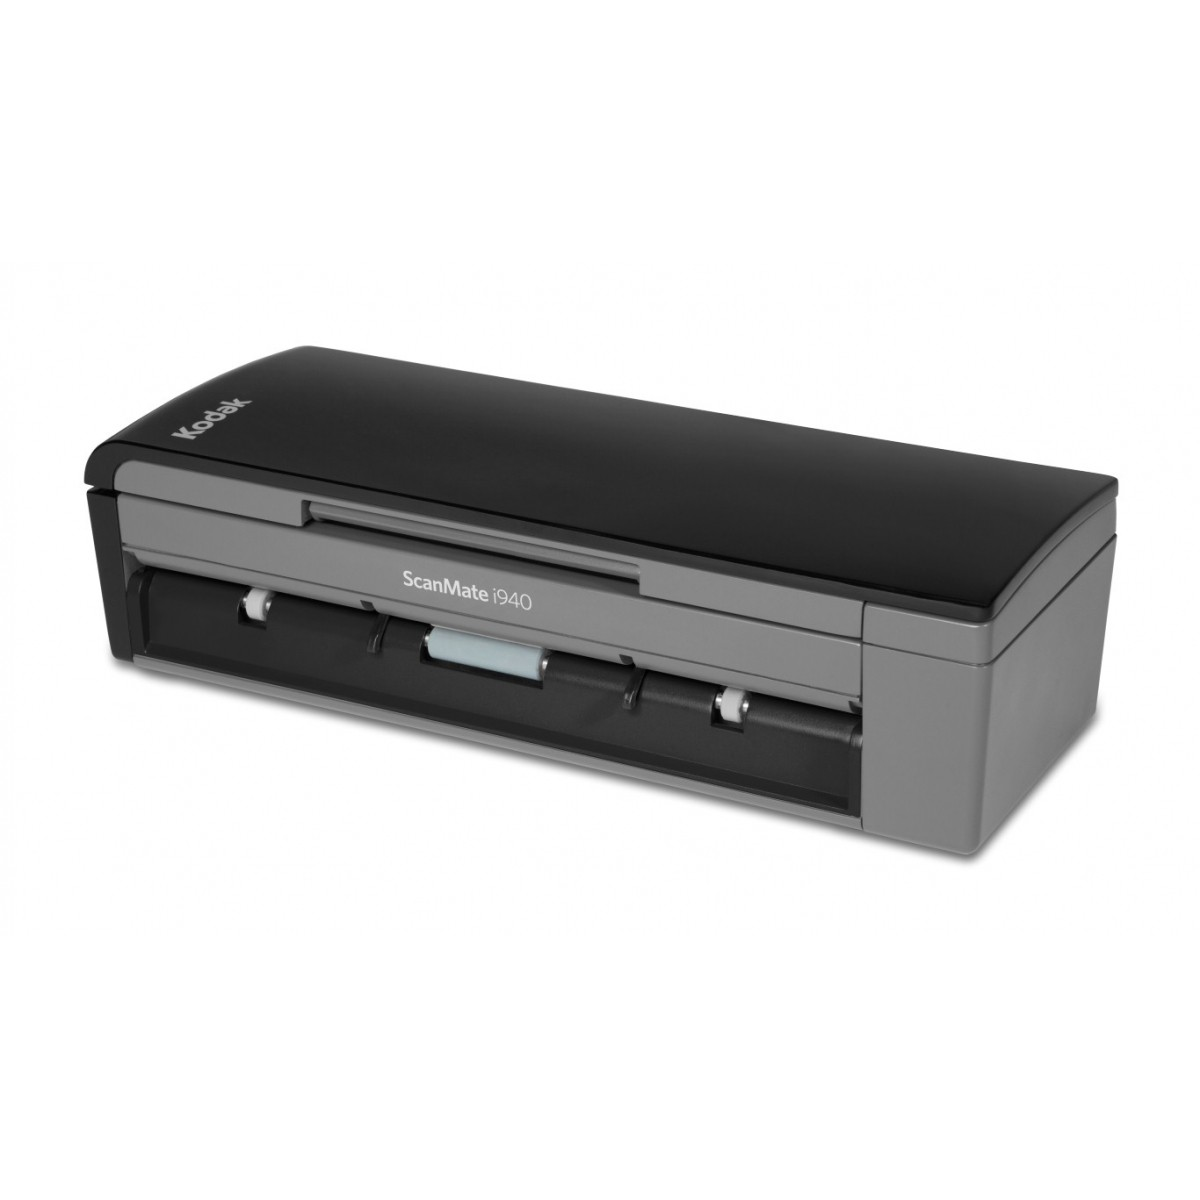 Scanner Portátil A4 Kodak ScanMate i940 + 36 meses